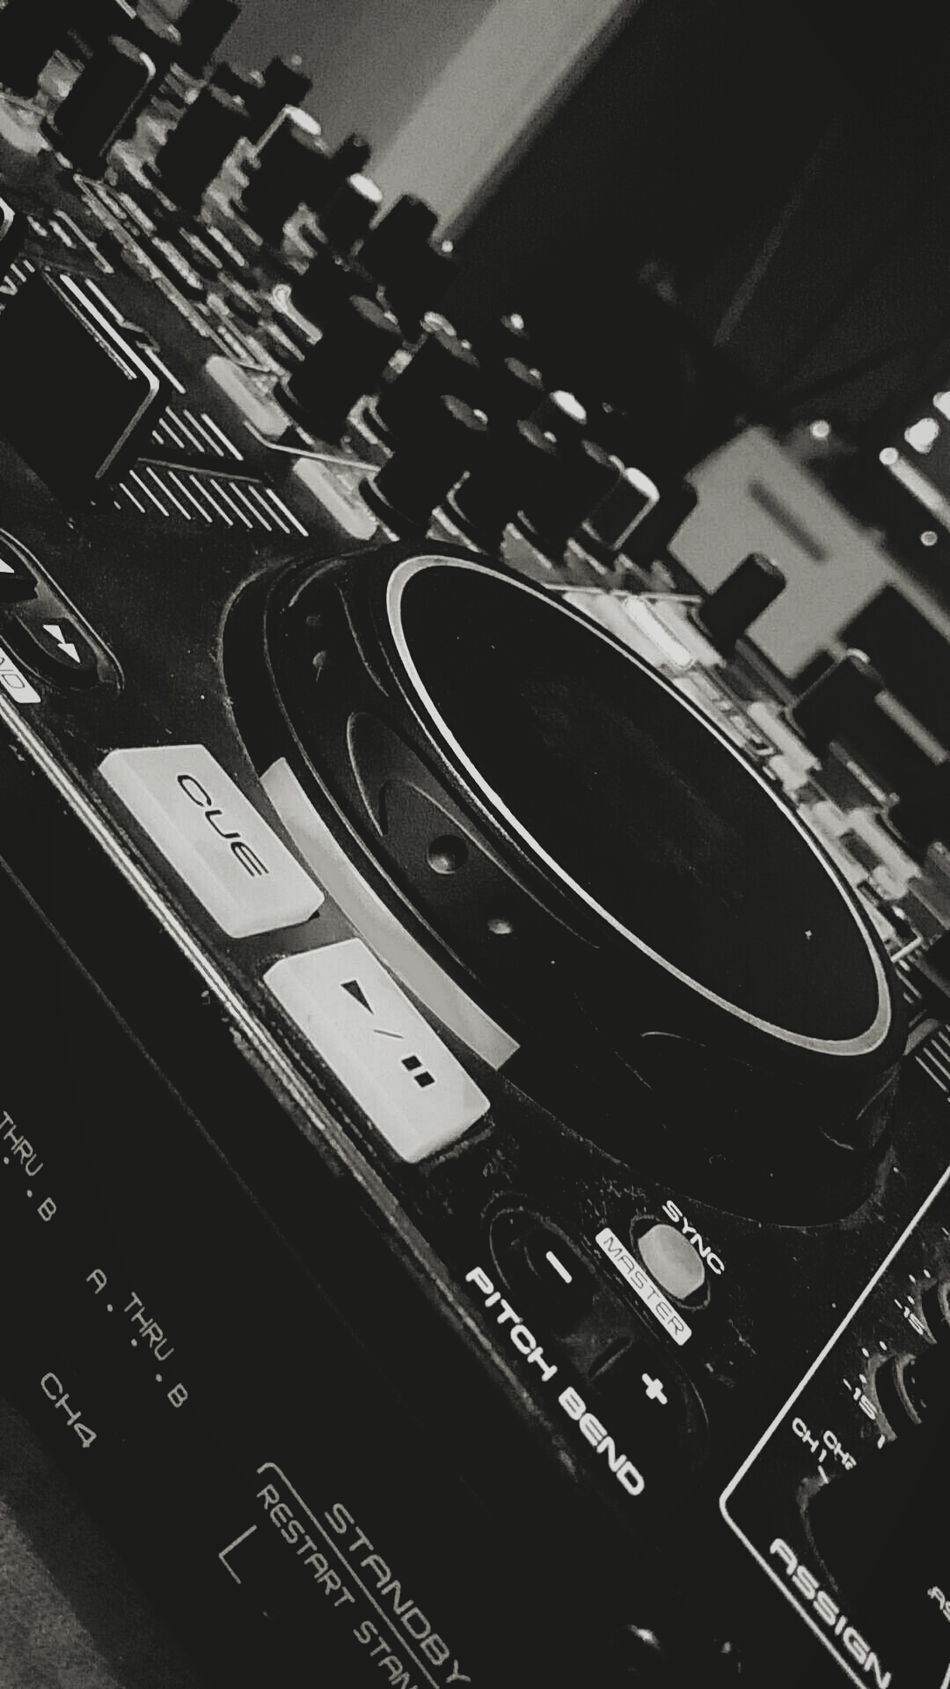 Denon DJ Samsungphotography Samsung Galaxy Note 3 Mixtape